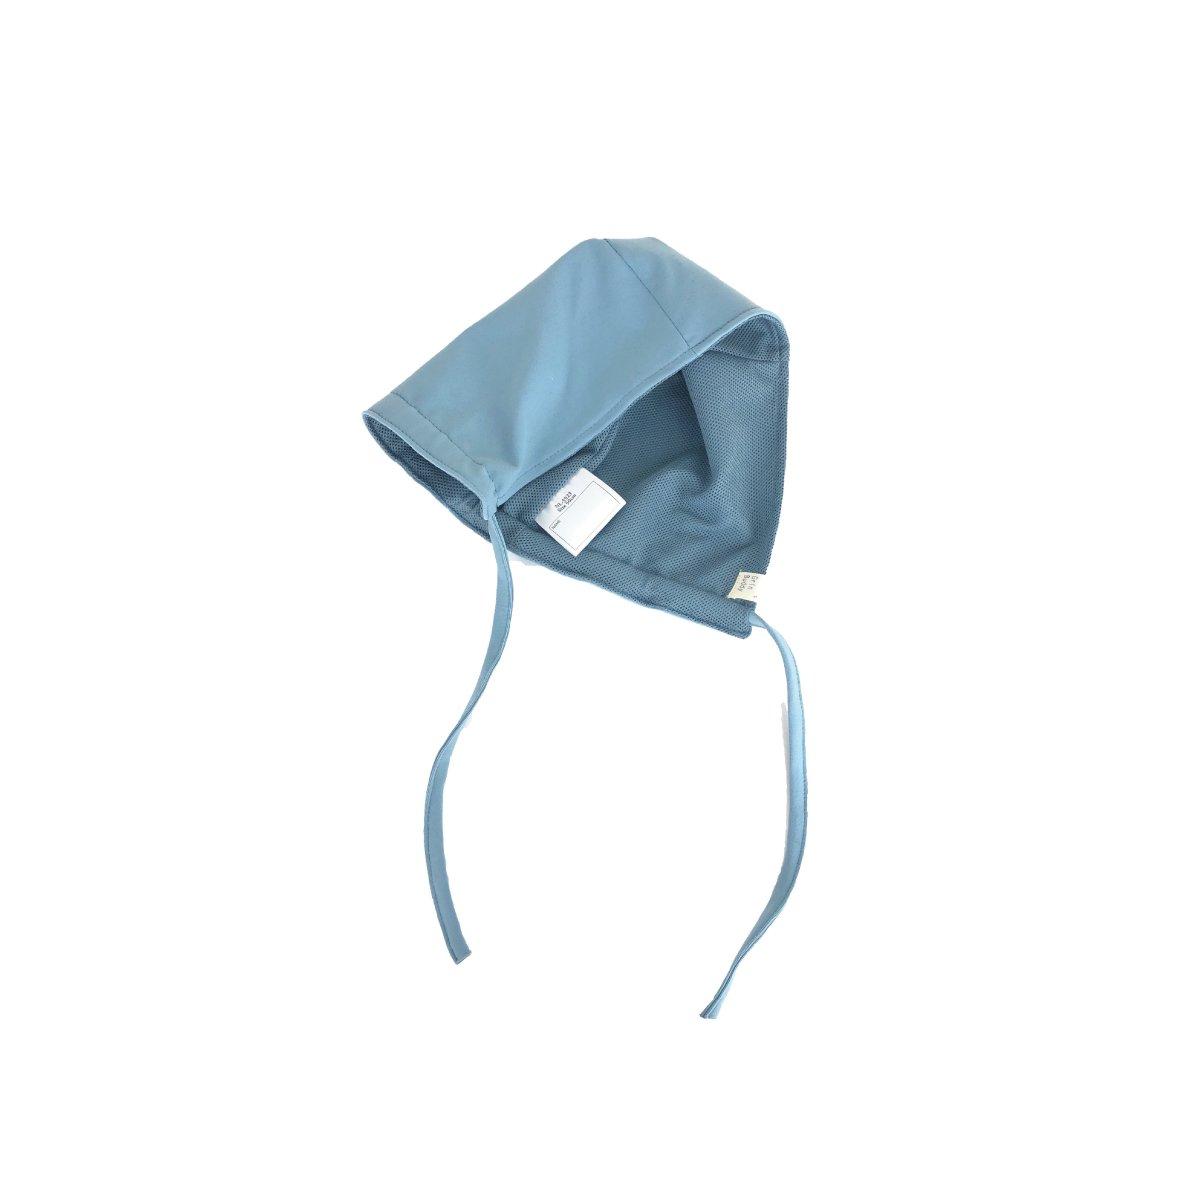 【BABY】Candy Bonnet 詳細画像12